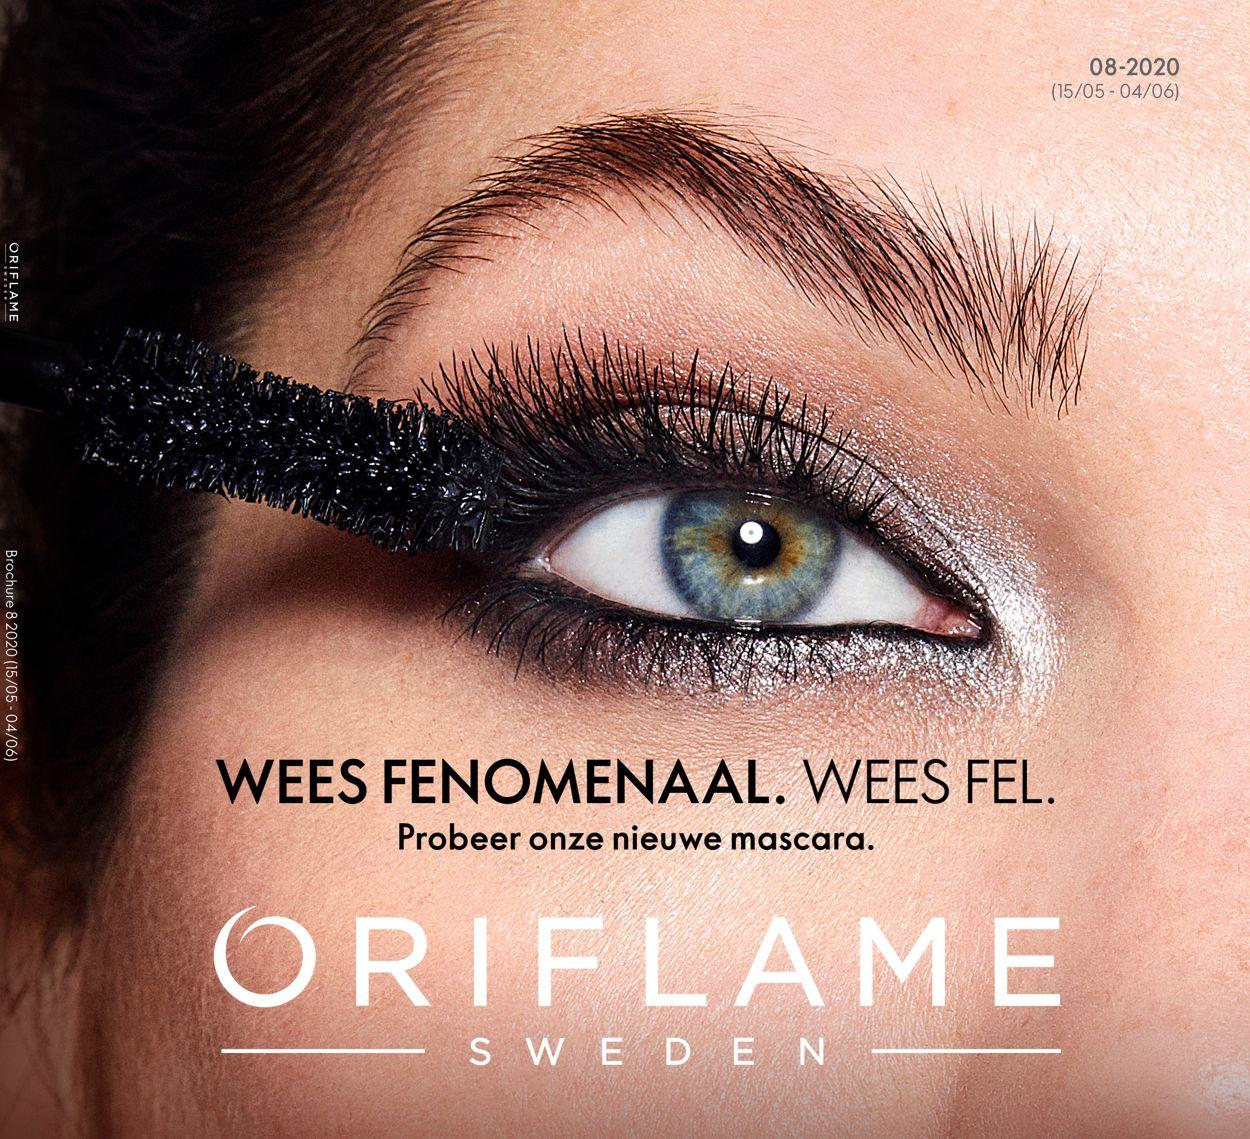 Oriflame Folder - 15.05-04.06.2020